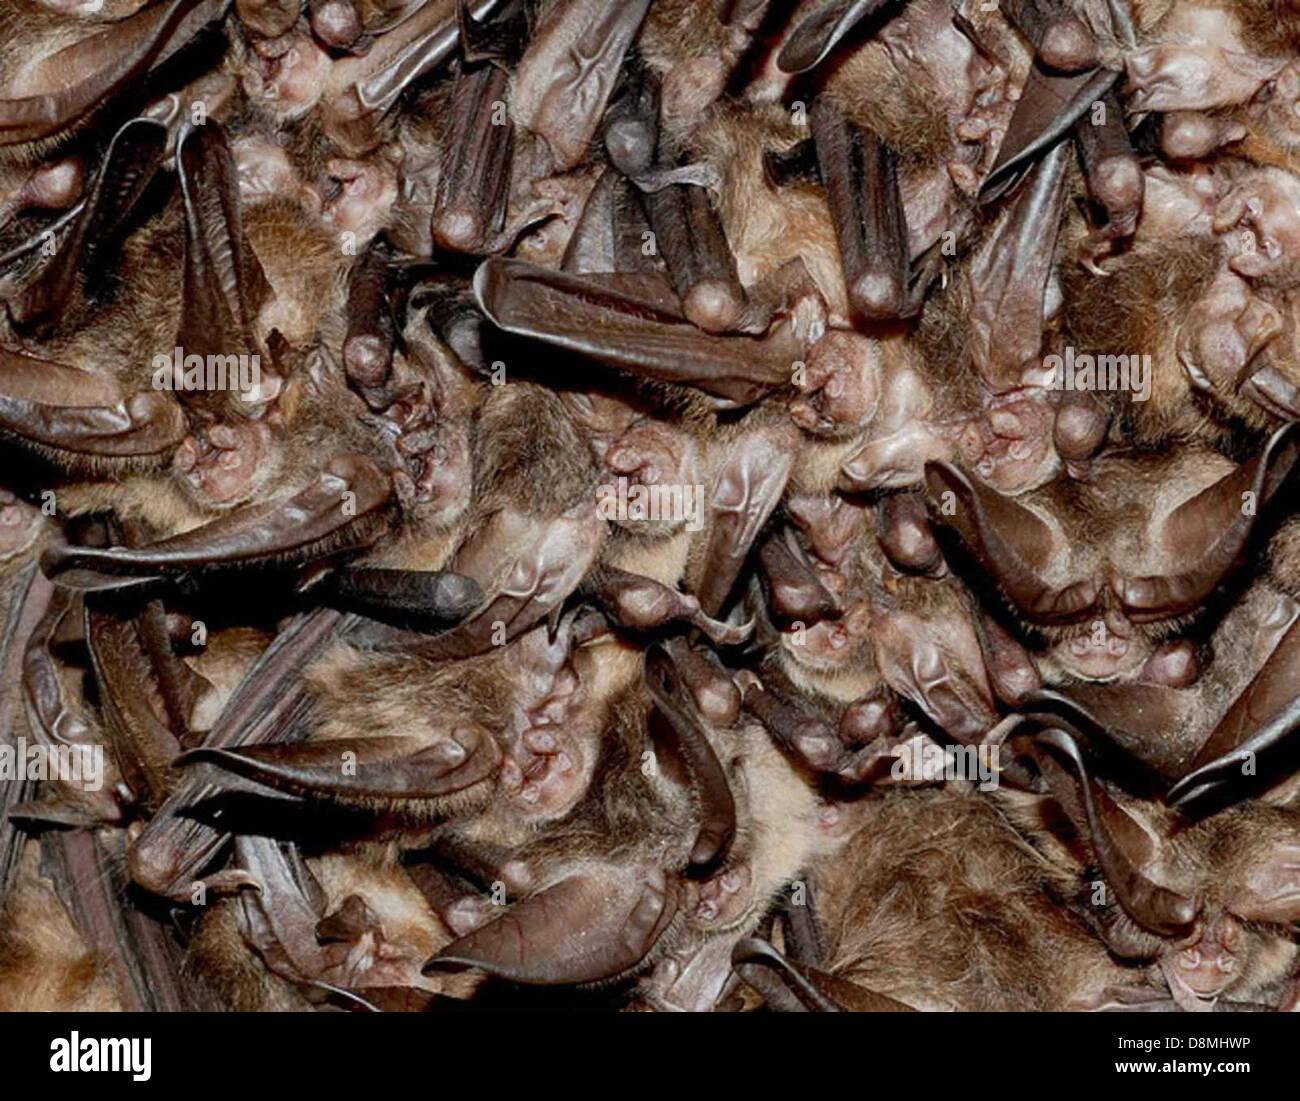 Cluster of hibernating virginia big eared bats. - Stock Image